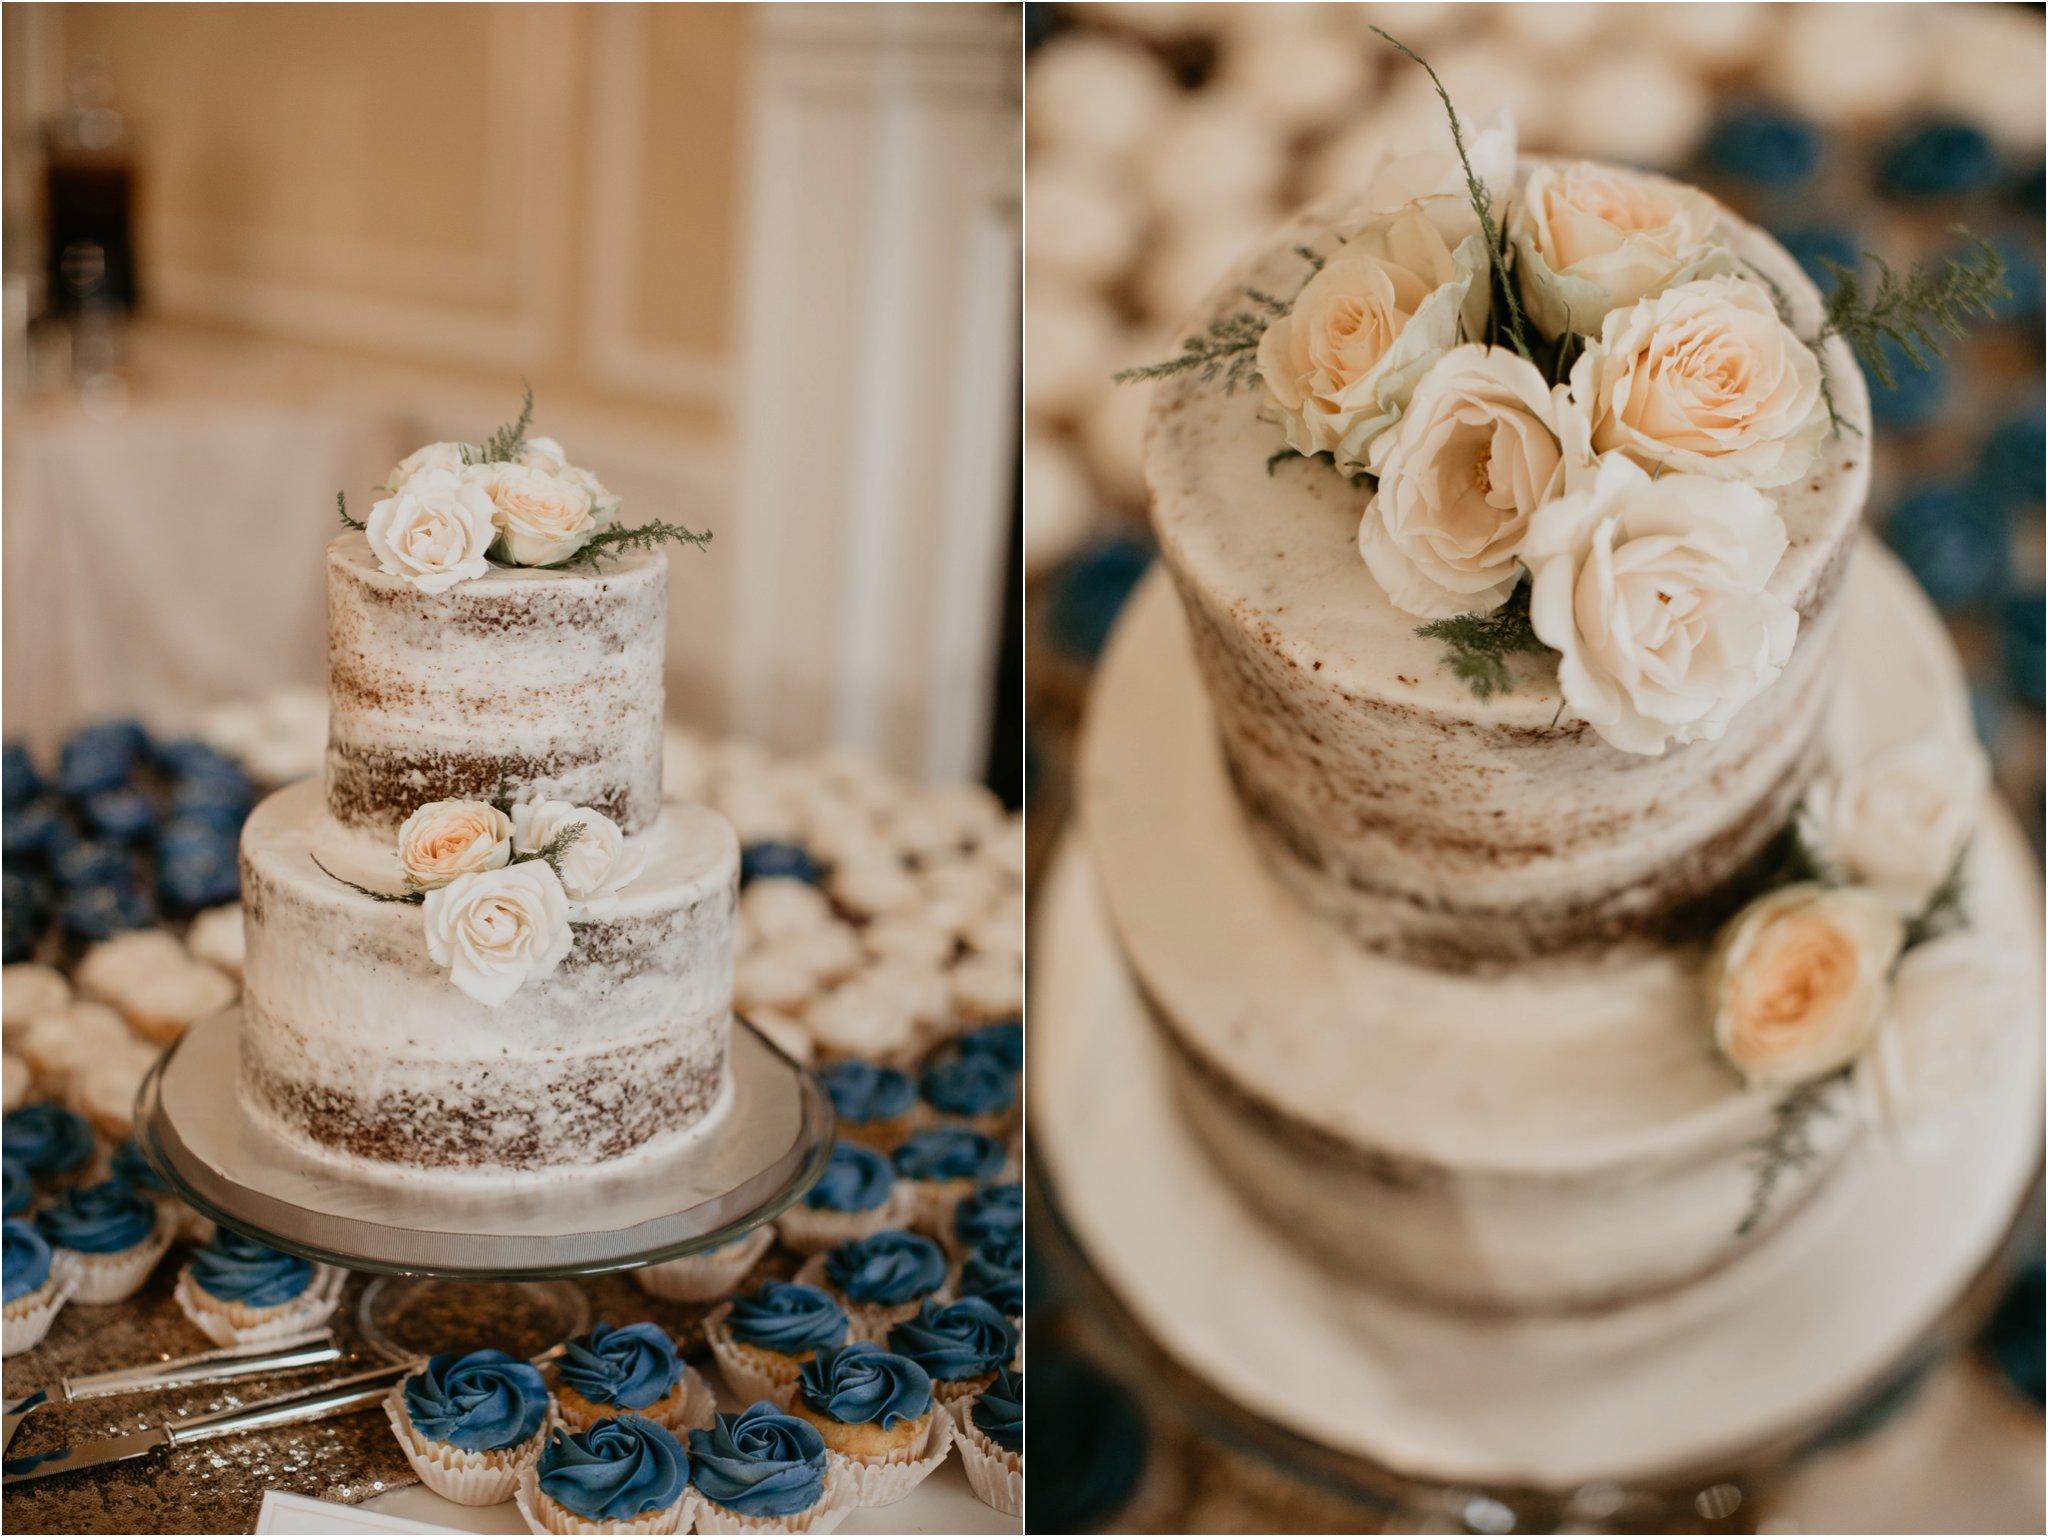 Patrick Henry Ballroom - Weddings - Virginia Wedding Photographer - Pat Cori Photography